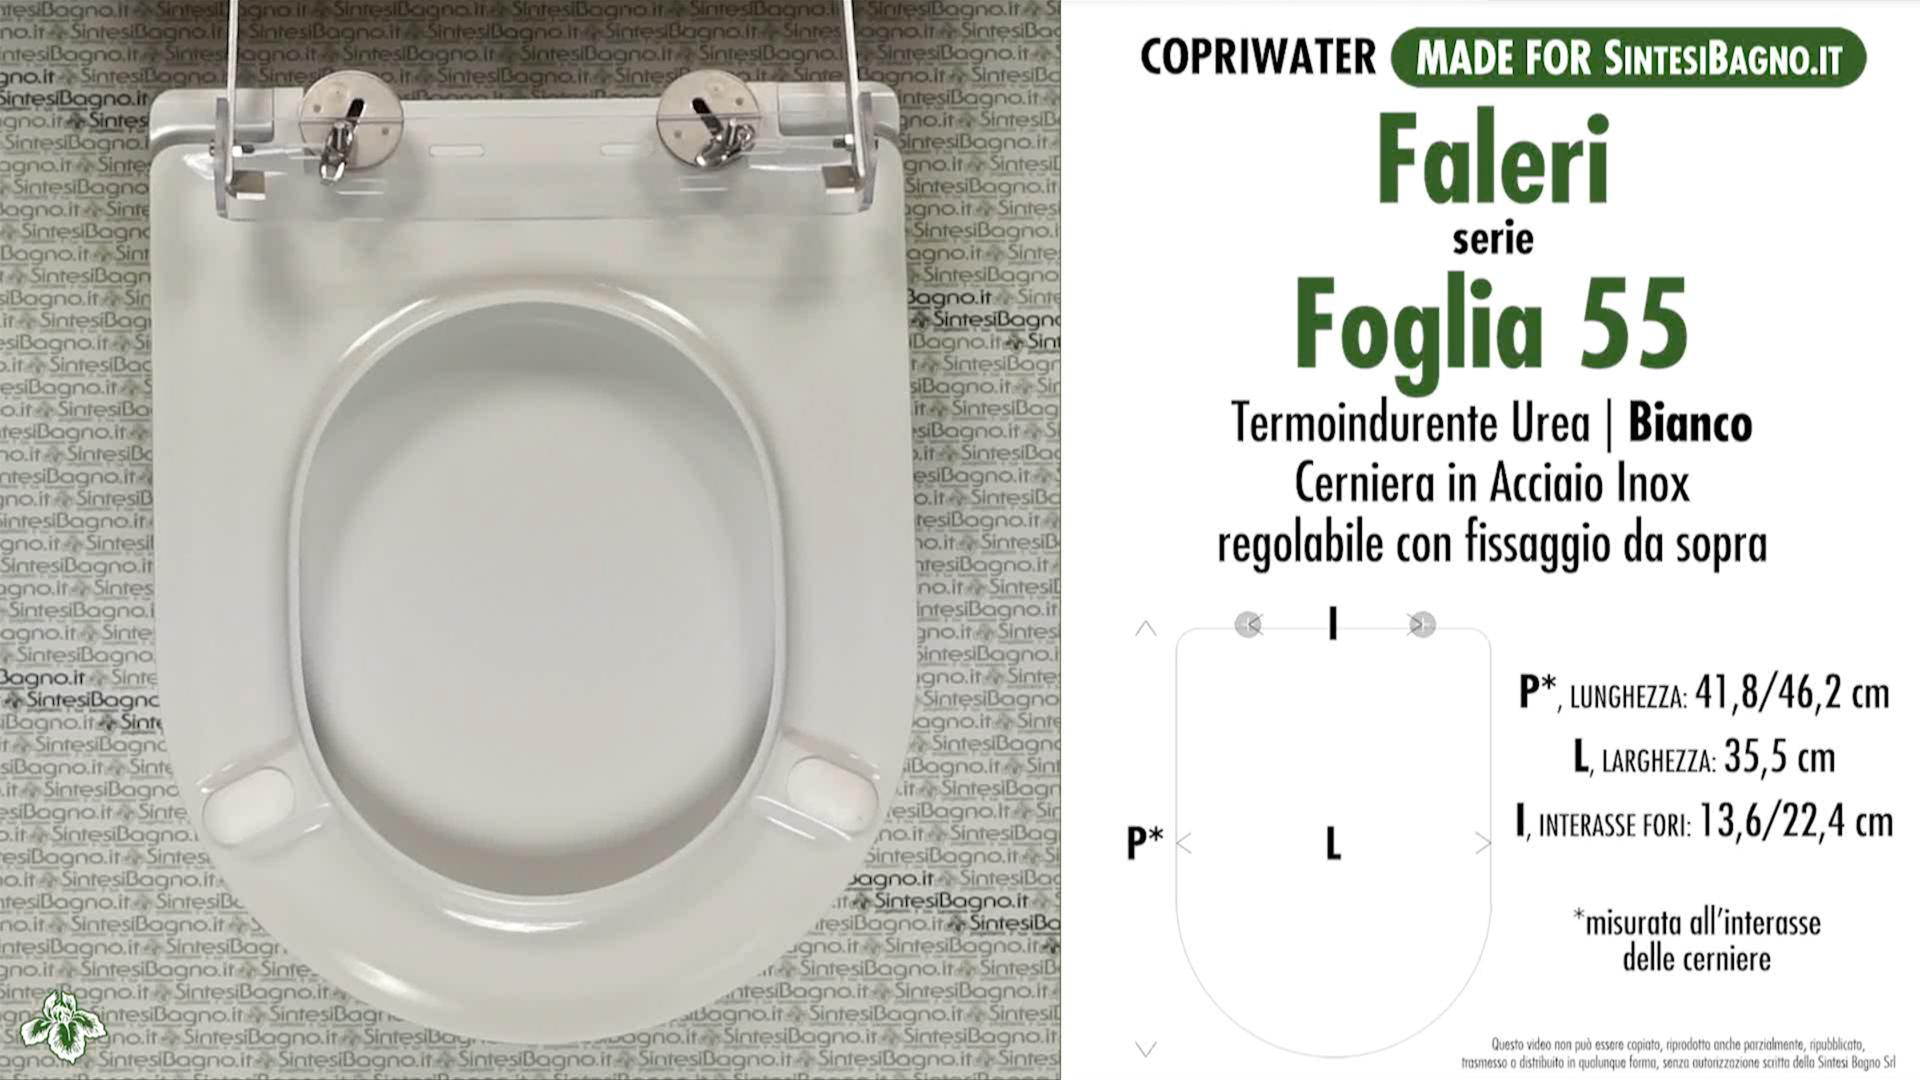 SCHEDA TECNICA MISURE copriwater FALERI FOGLIA 55